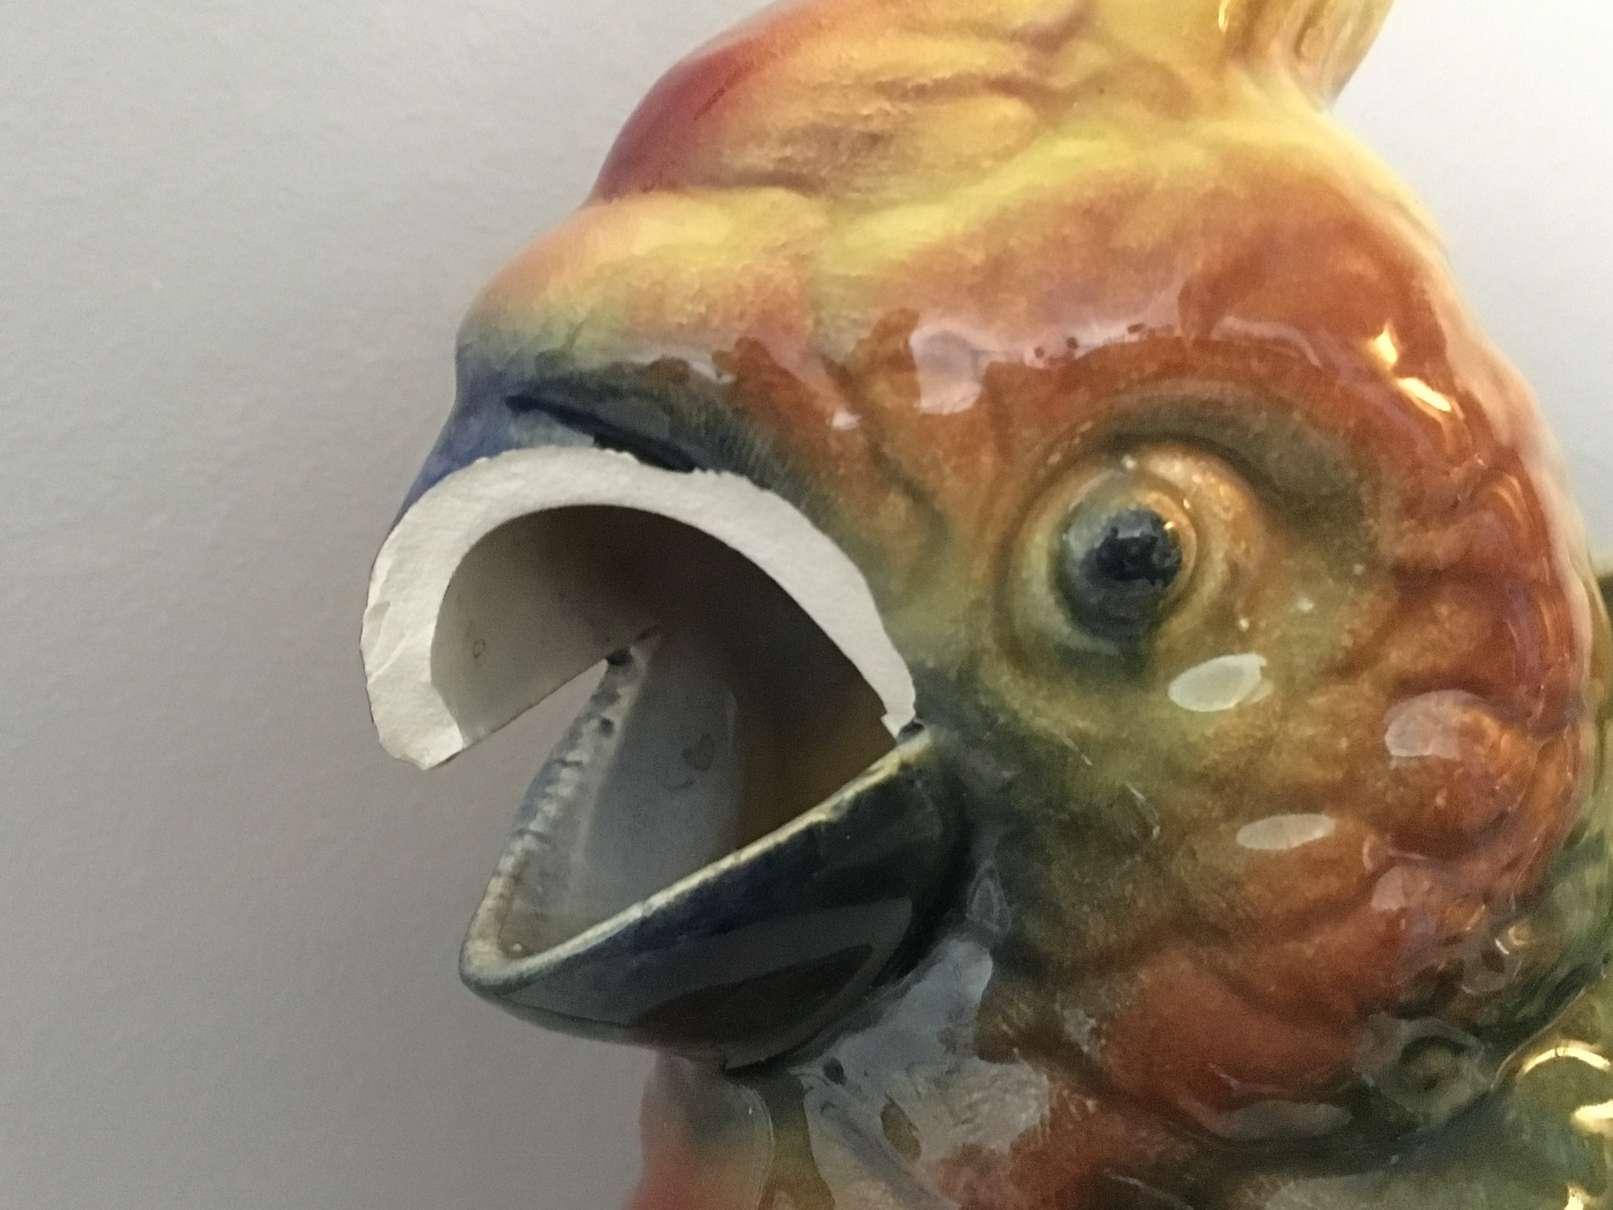 pichet-barbotine-faience-ceramique-perroquet-saint-clemen-sarreguemines-luneville-art-ancien-restauration-restaurarte-email-glaçure-oxyde-metallique.jpg